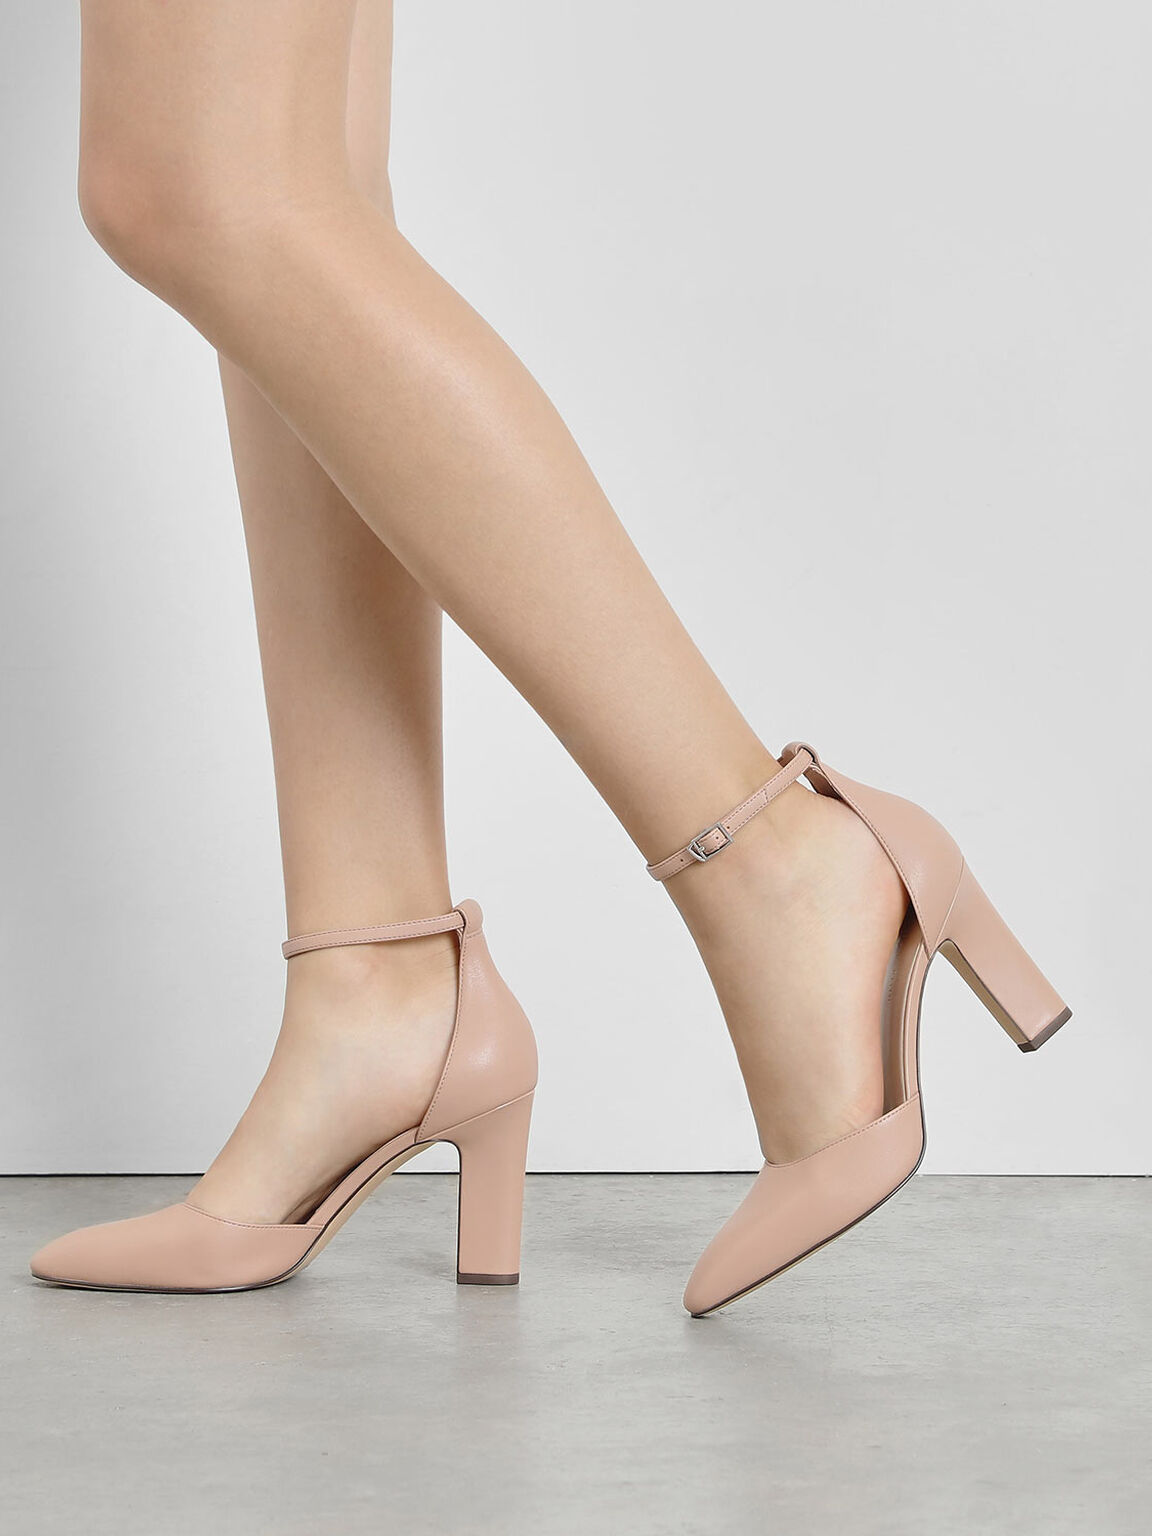 D'Orsay Ankle Strap Pumps, Nude, hi-res